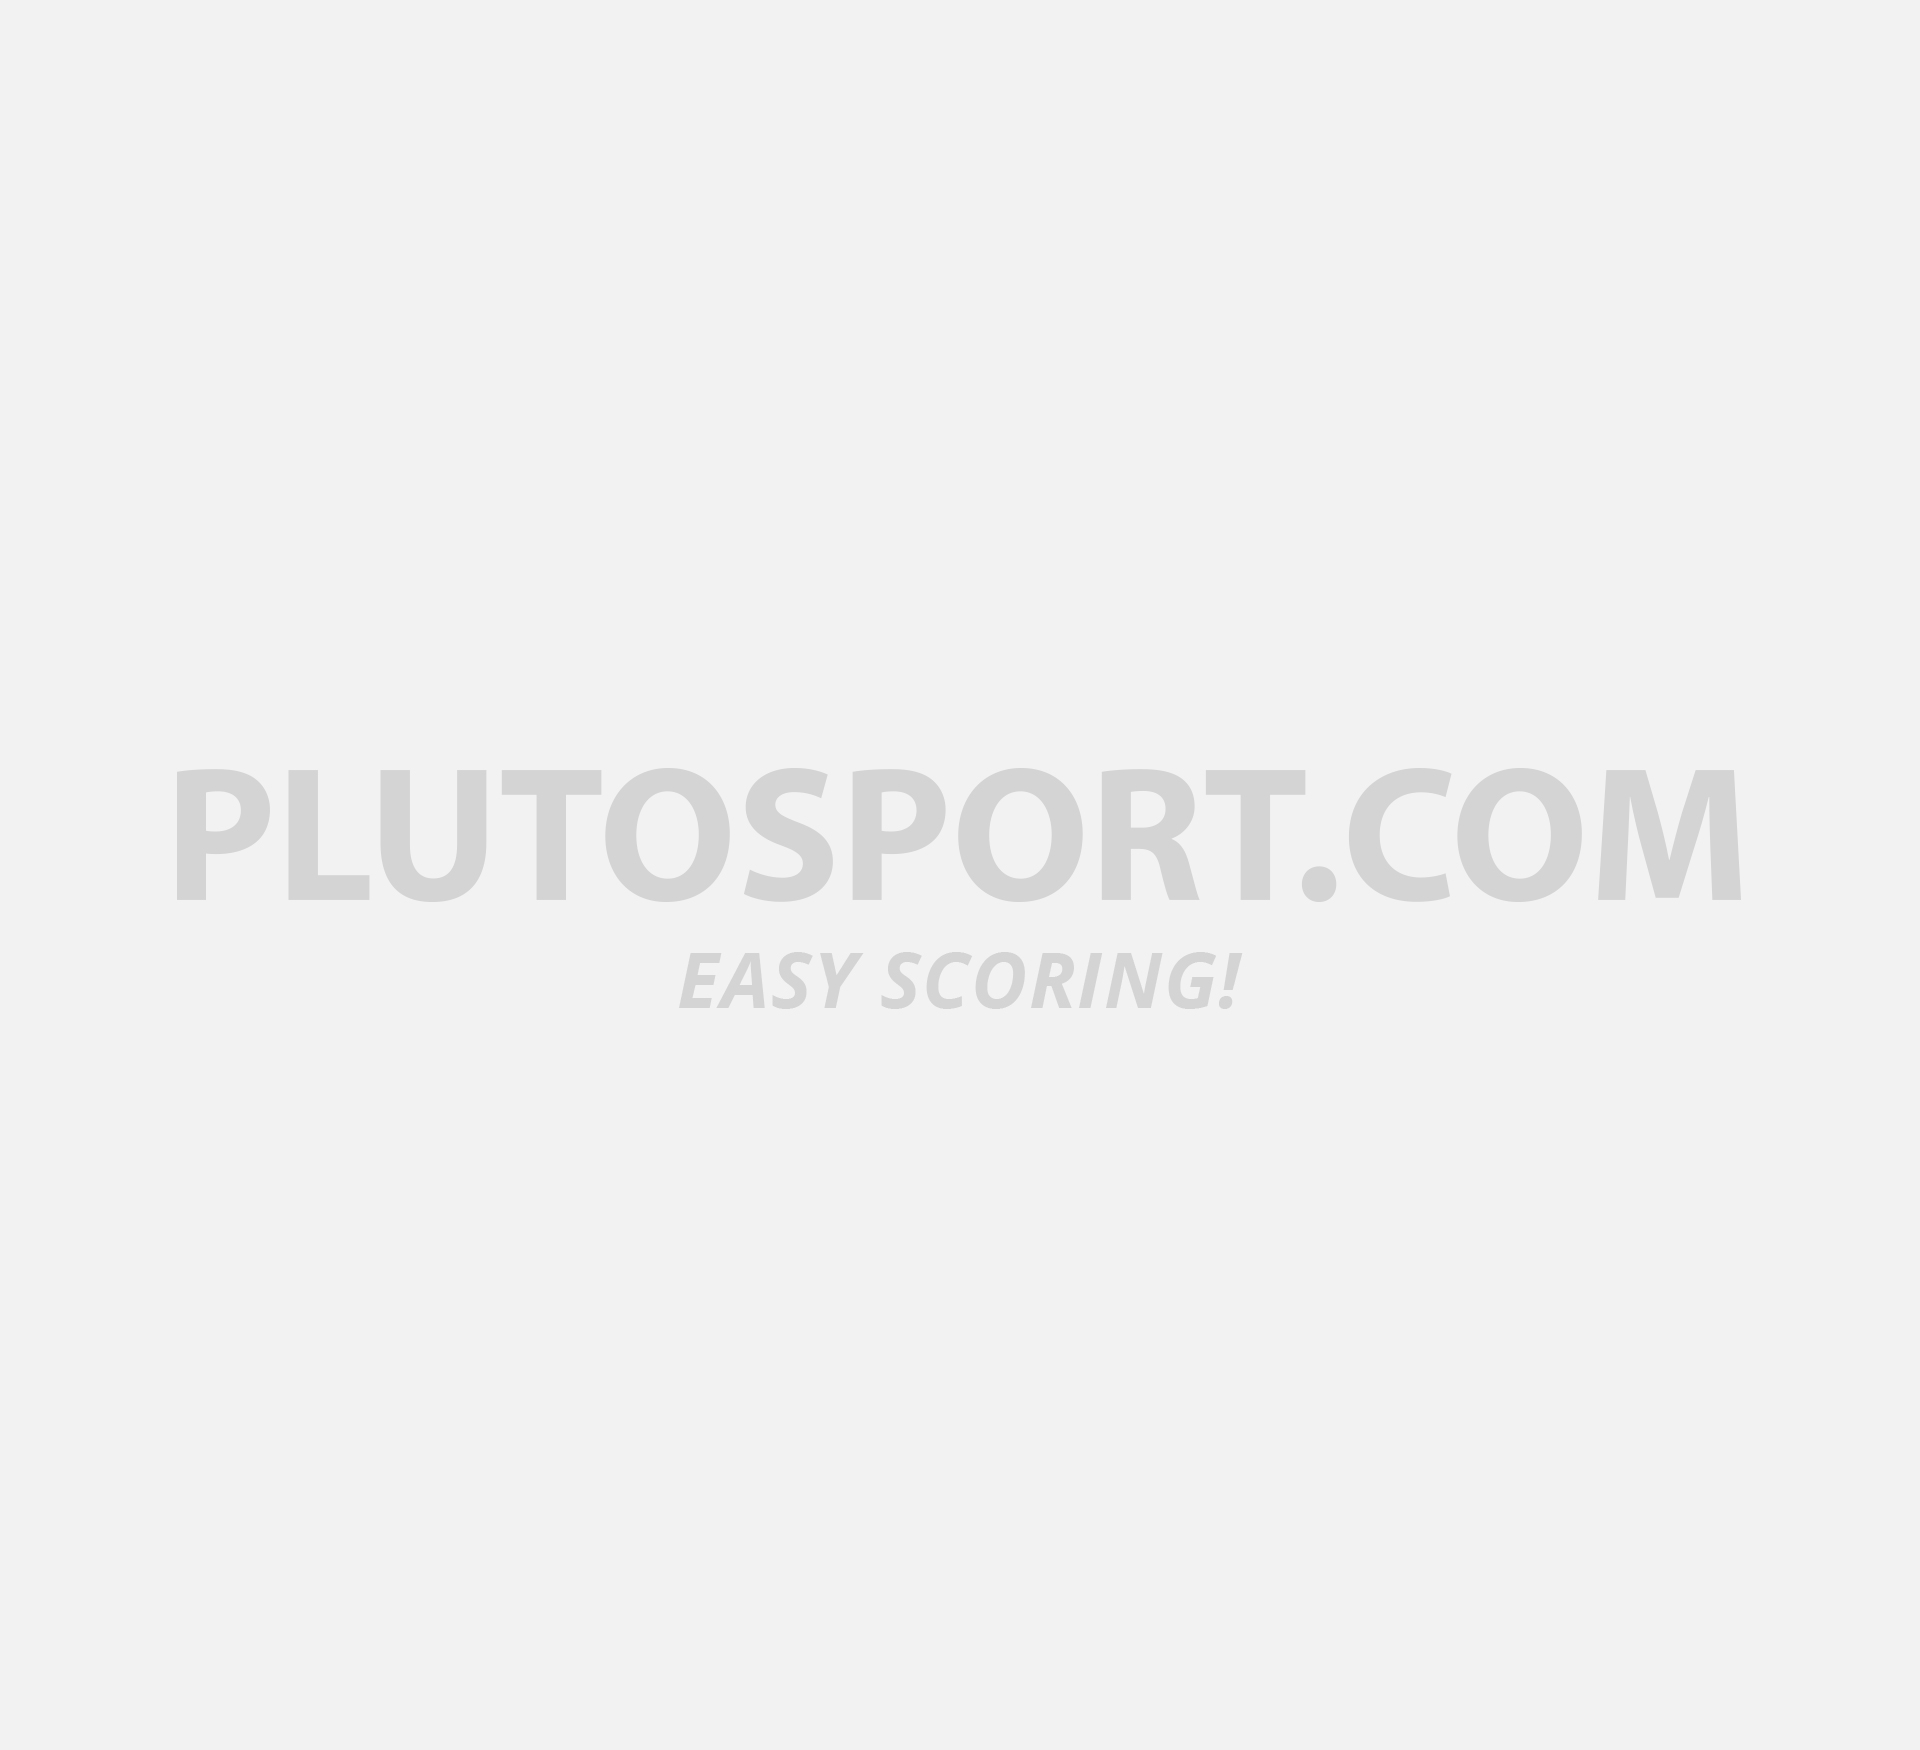 de9e95363 Puma Red Bull Racing New Block Cap - Caps - Accessories - Lifestyle -  Sports   Plutosport